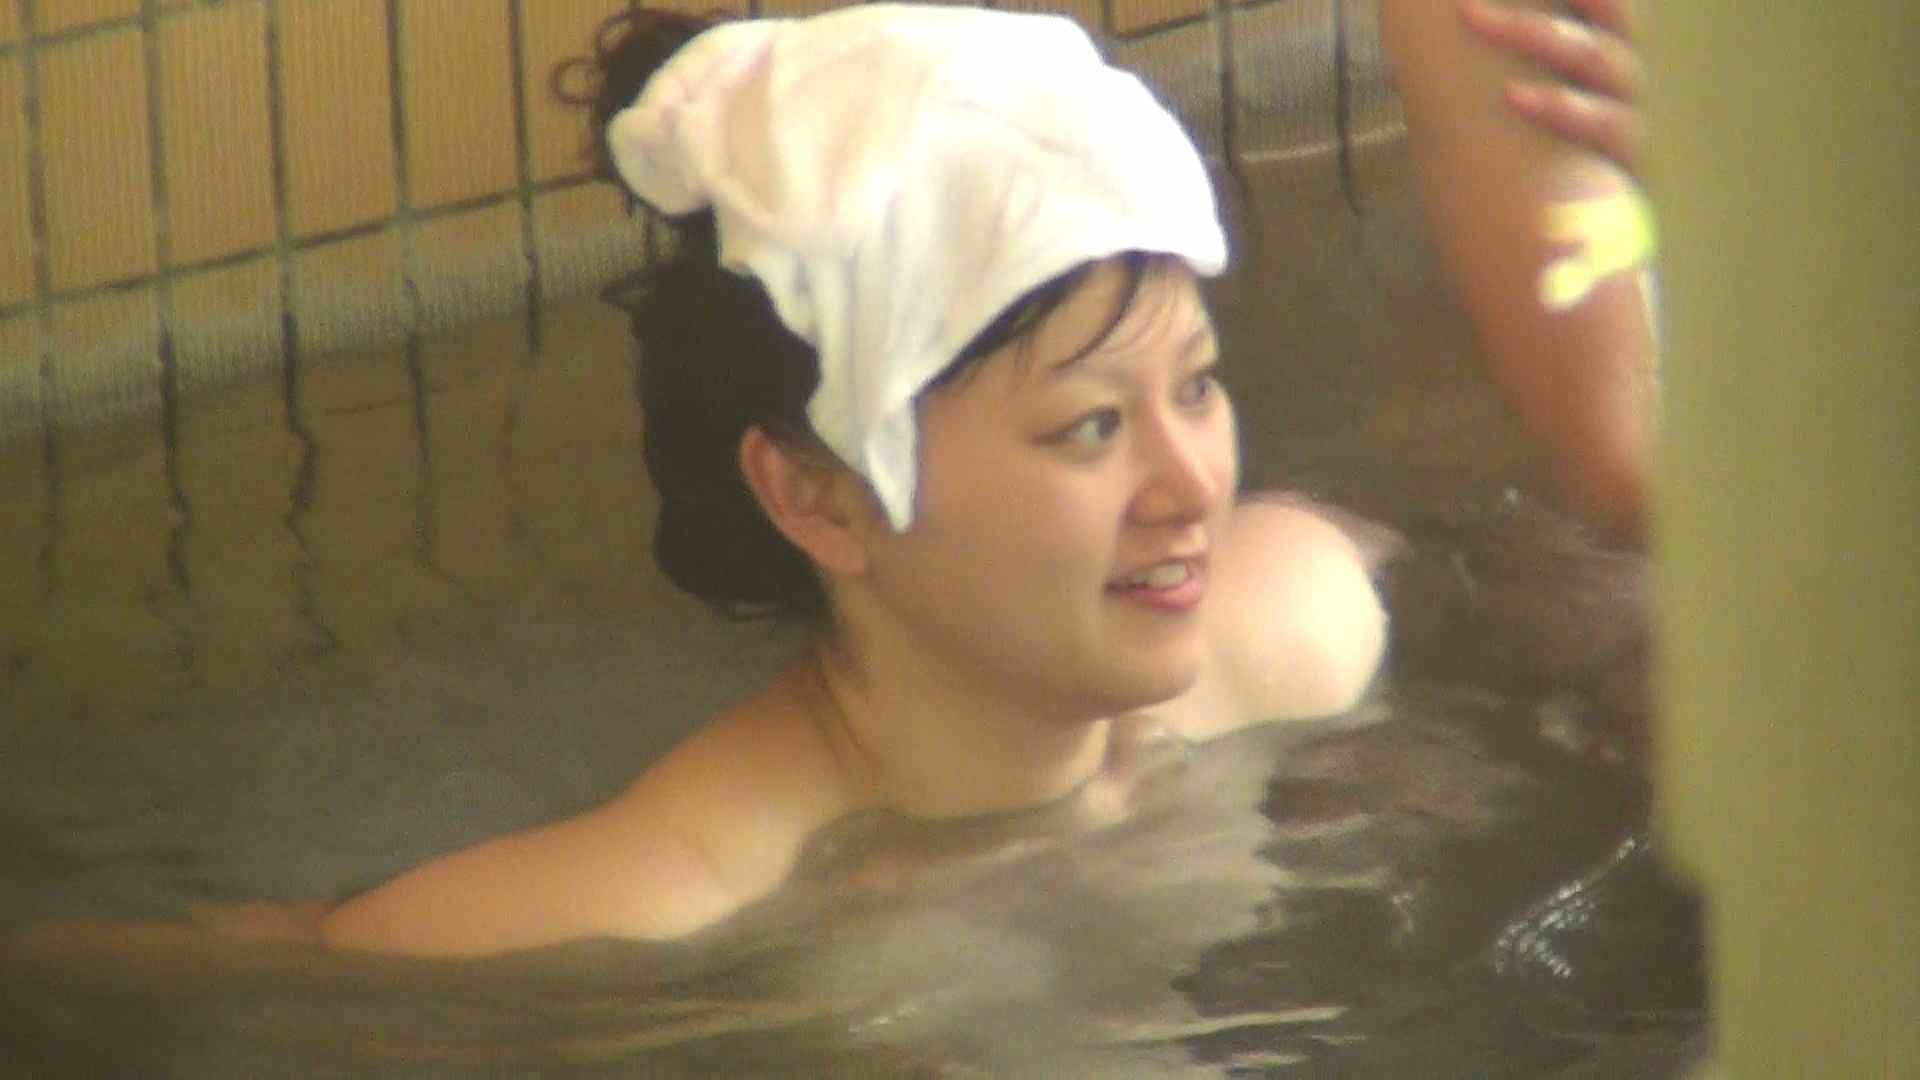 Aquaな露天風呂Vol.302 盗撮師作品  82pic 57